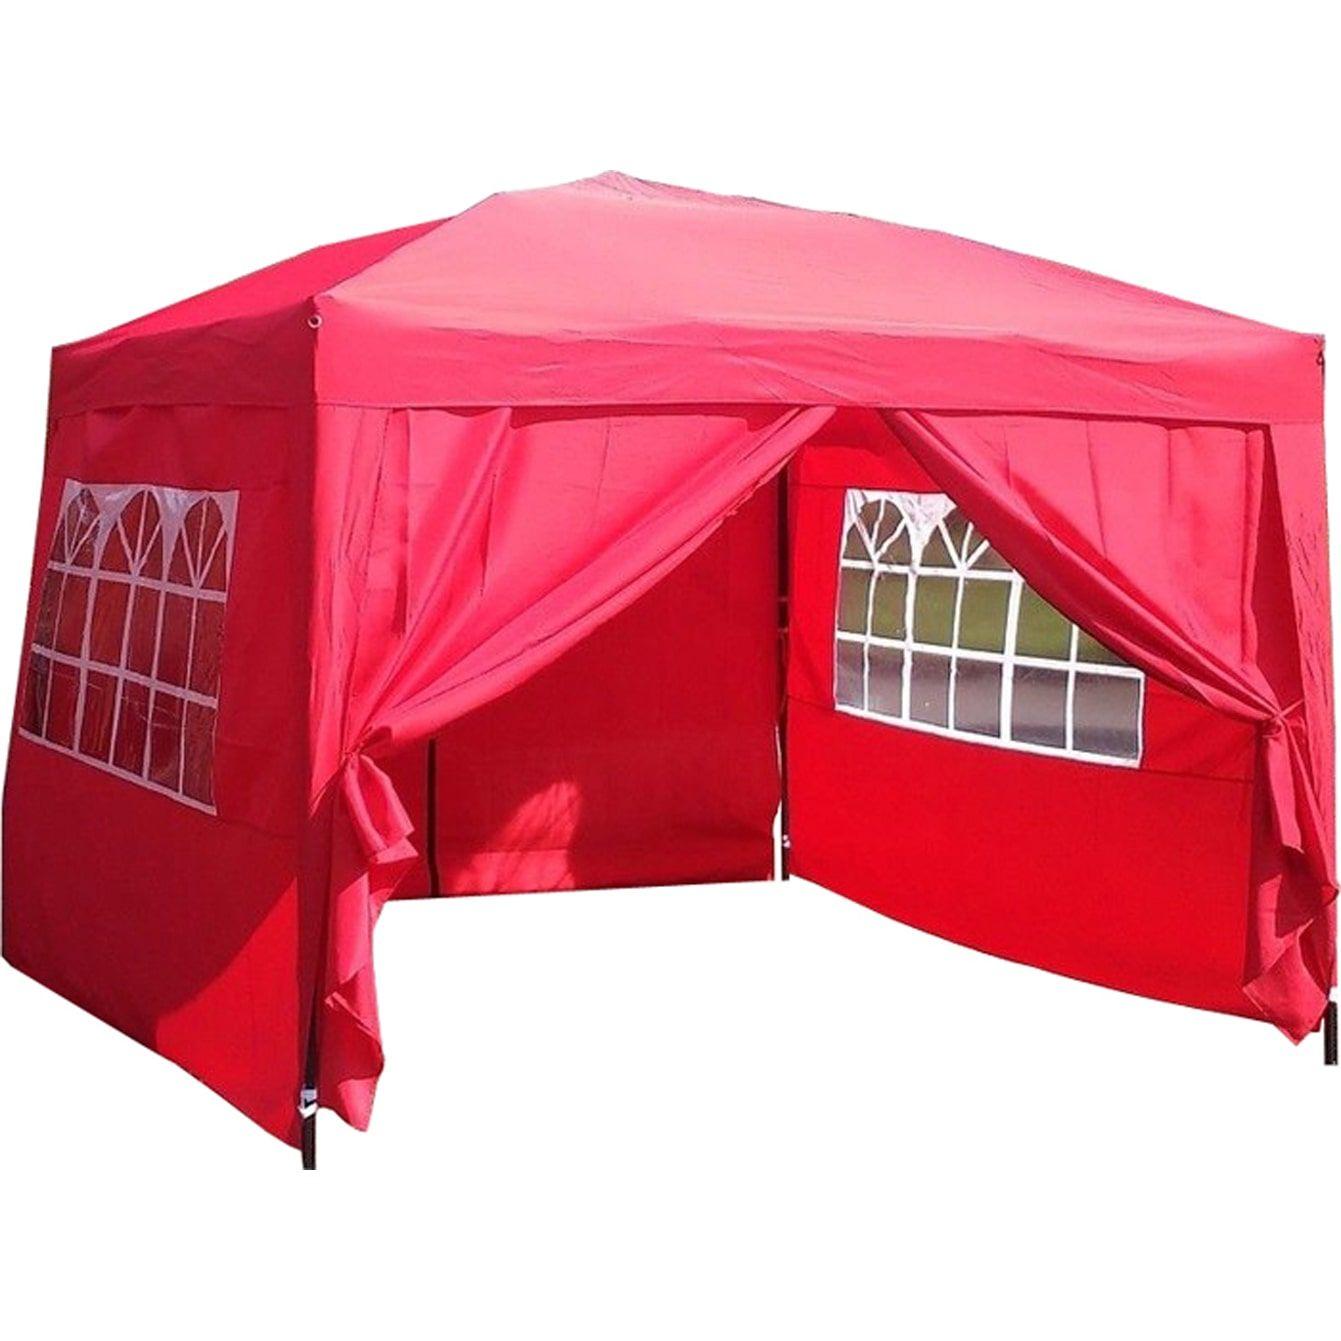 Mcombo 10x10 Ft Ez Pop Up 4 Walls Canopy Party Tent Gazebo